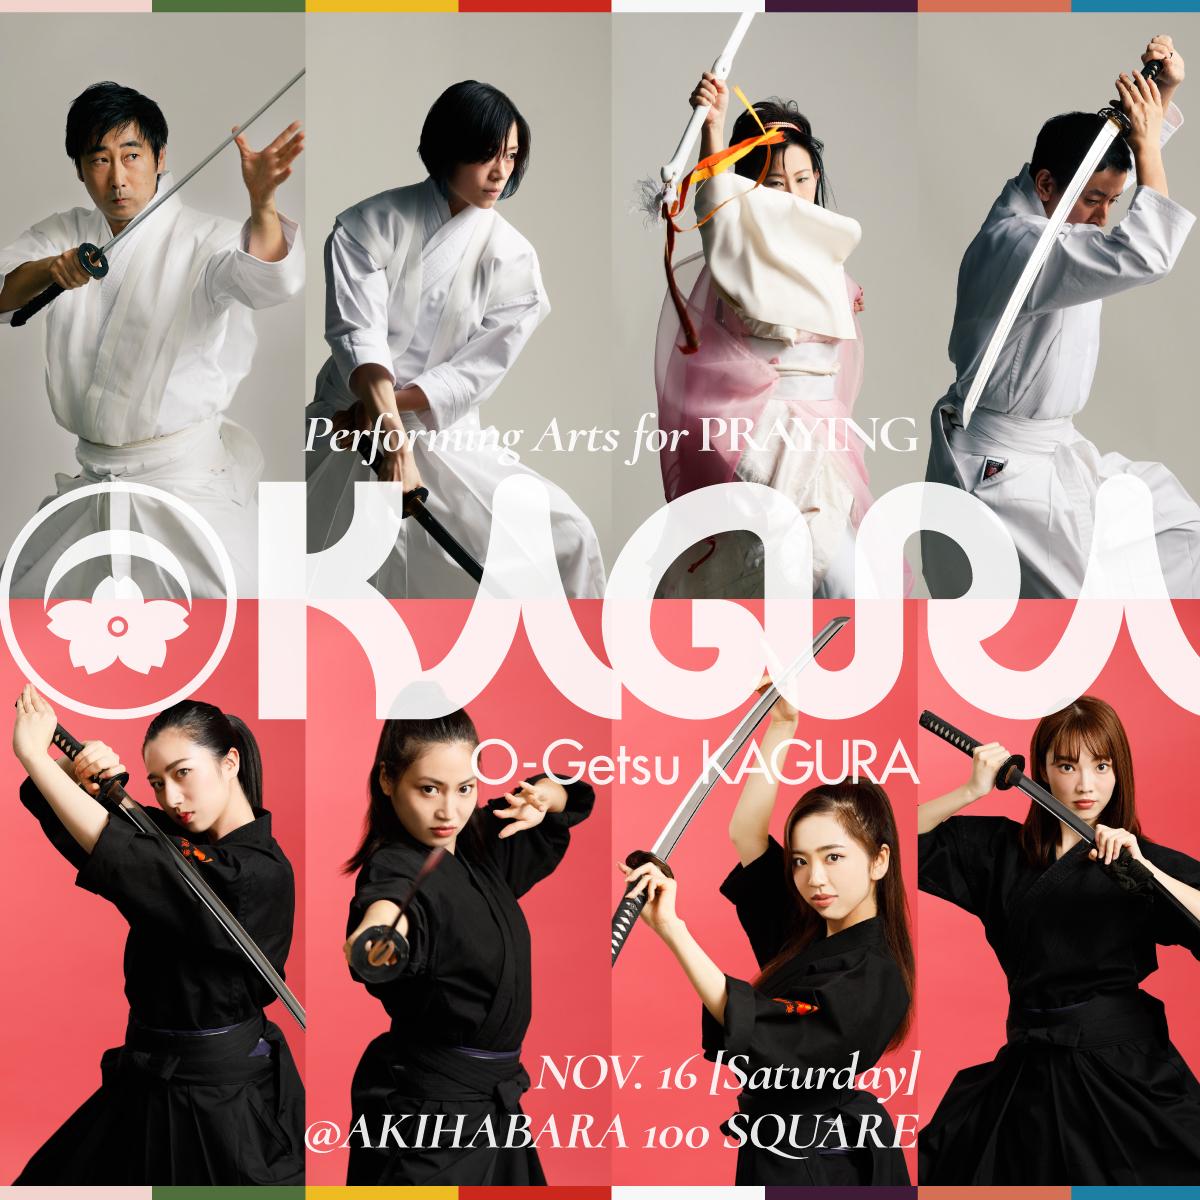 O-Getsu KAGURA - O-Getsu Ryu | 桜月流美劔道